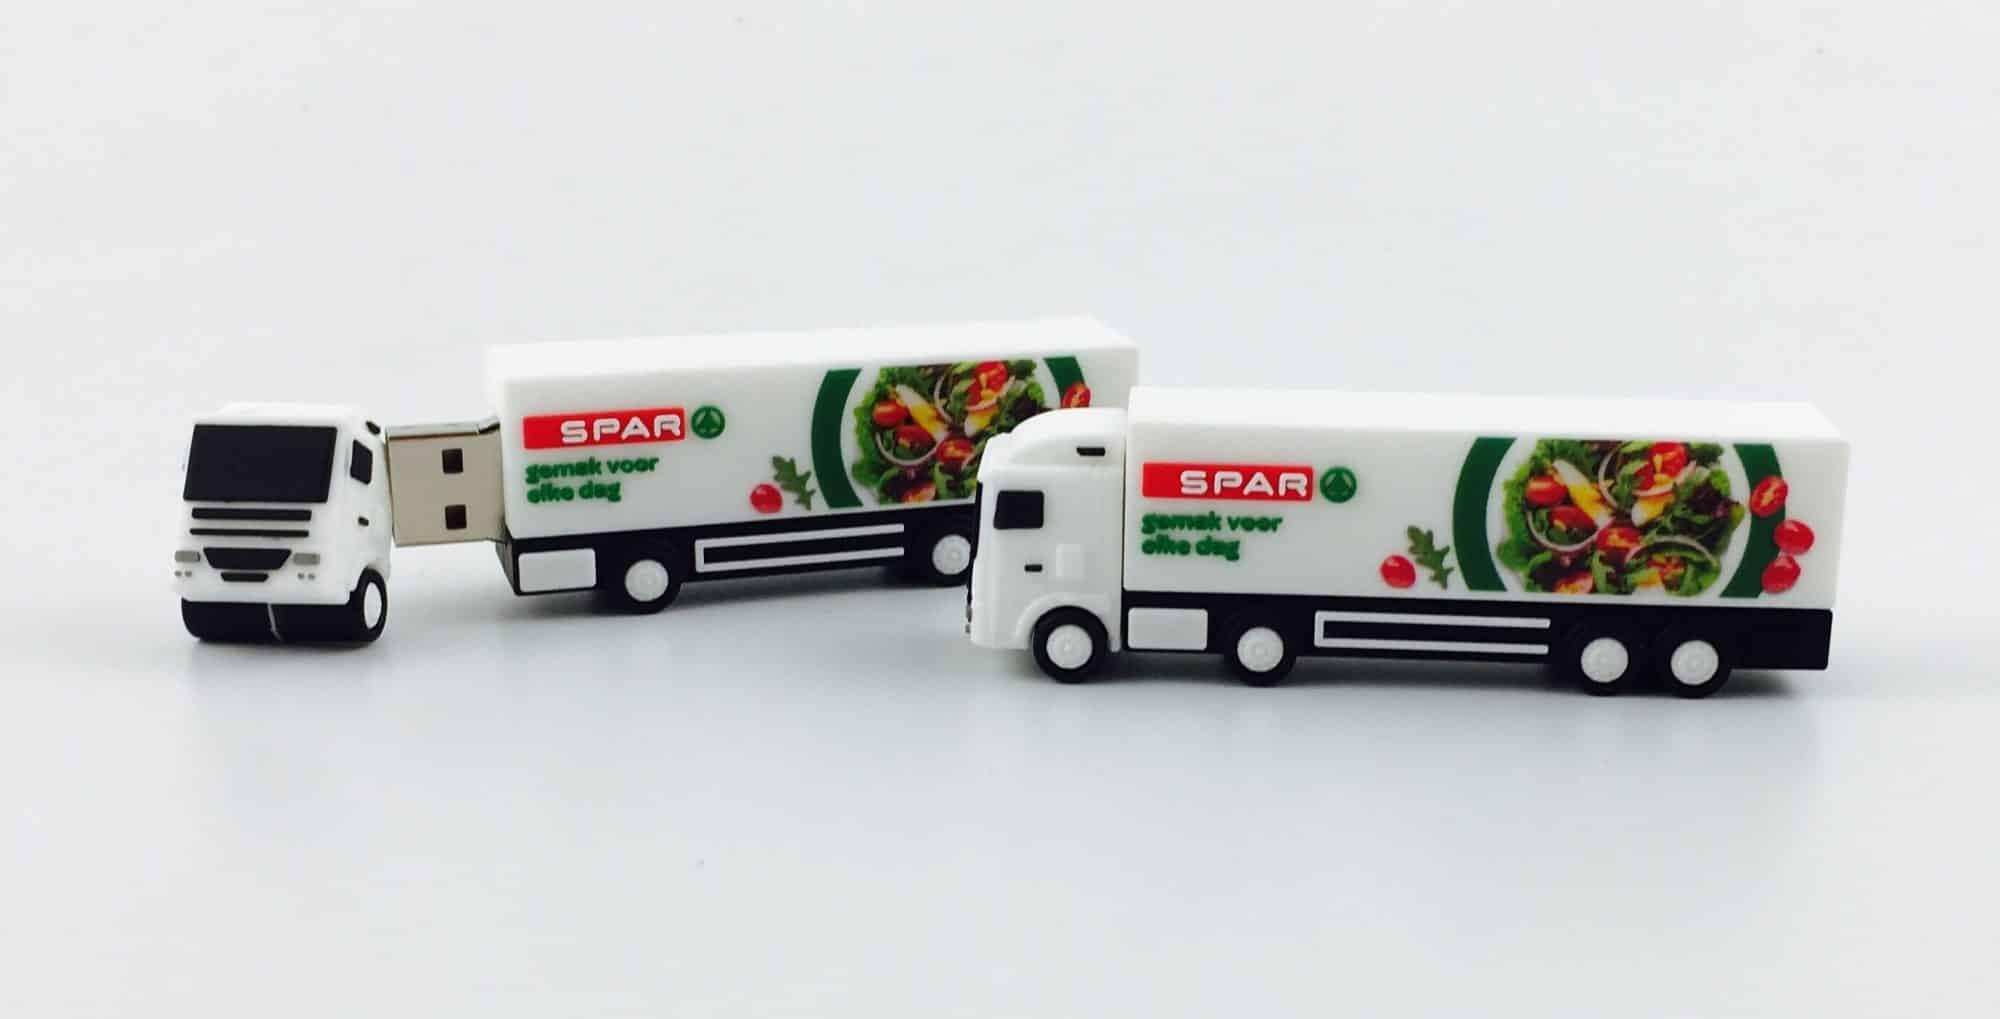 USB-stick vrachtwagen SPAR met full colour bedrukking logo